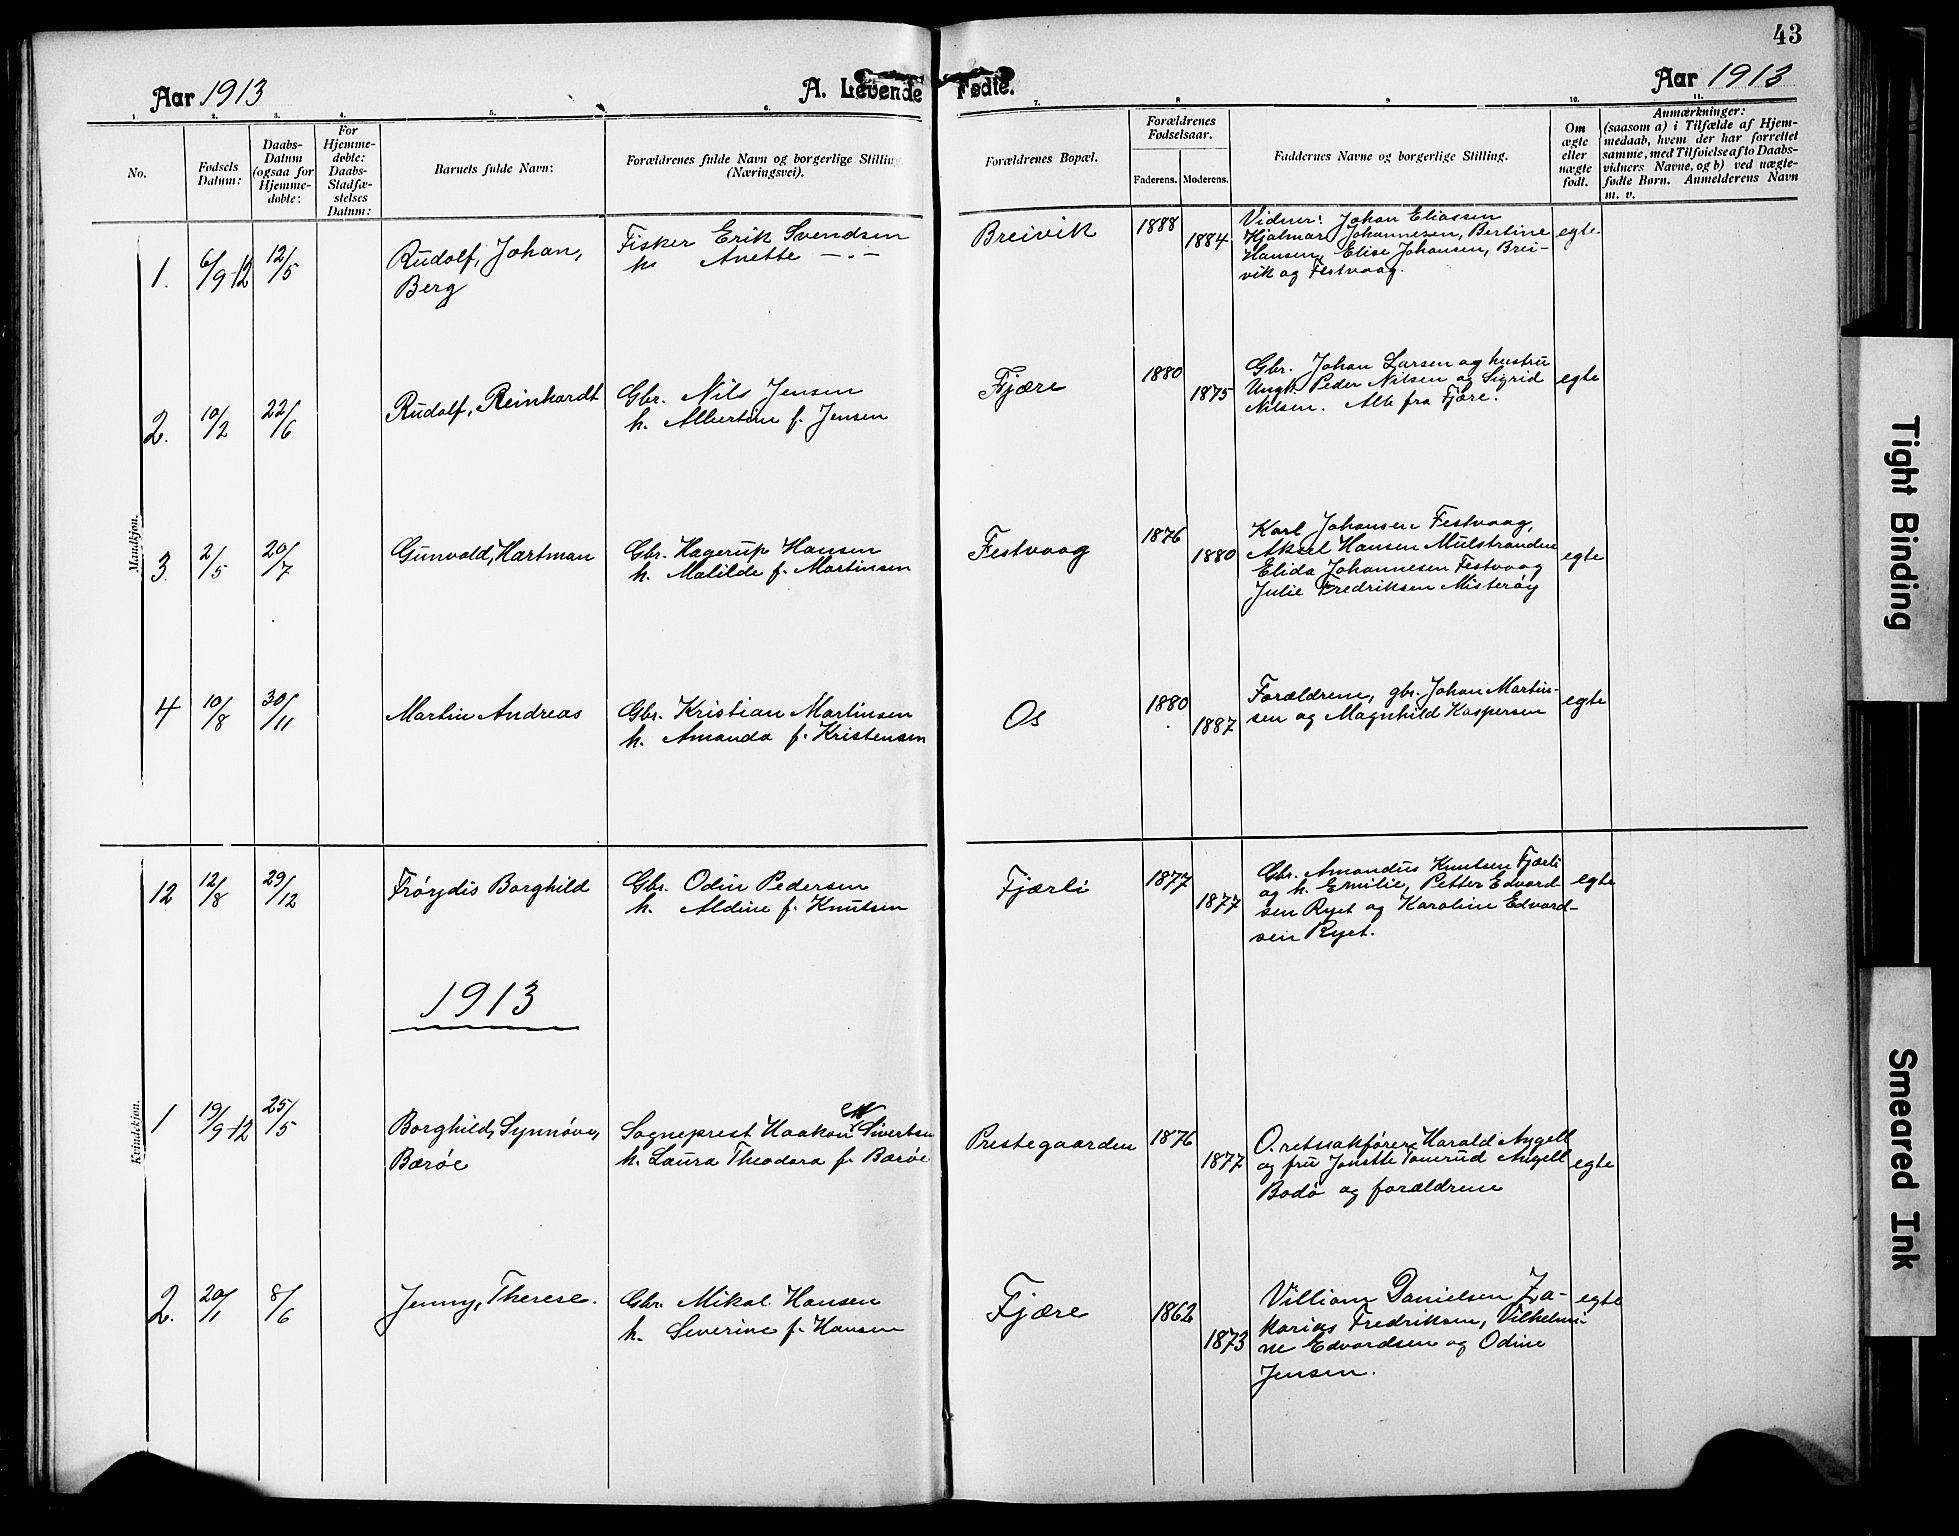 SAT, Ministerialprotokoller, klokkerbøker og fødselsregistre - Nordland, 803/L0077: Klokkerbok nr. 803C04, 1897-1930, s. 43